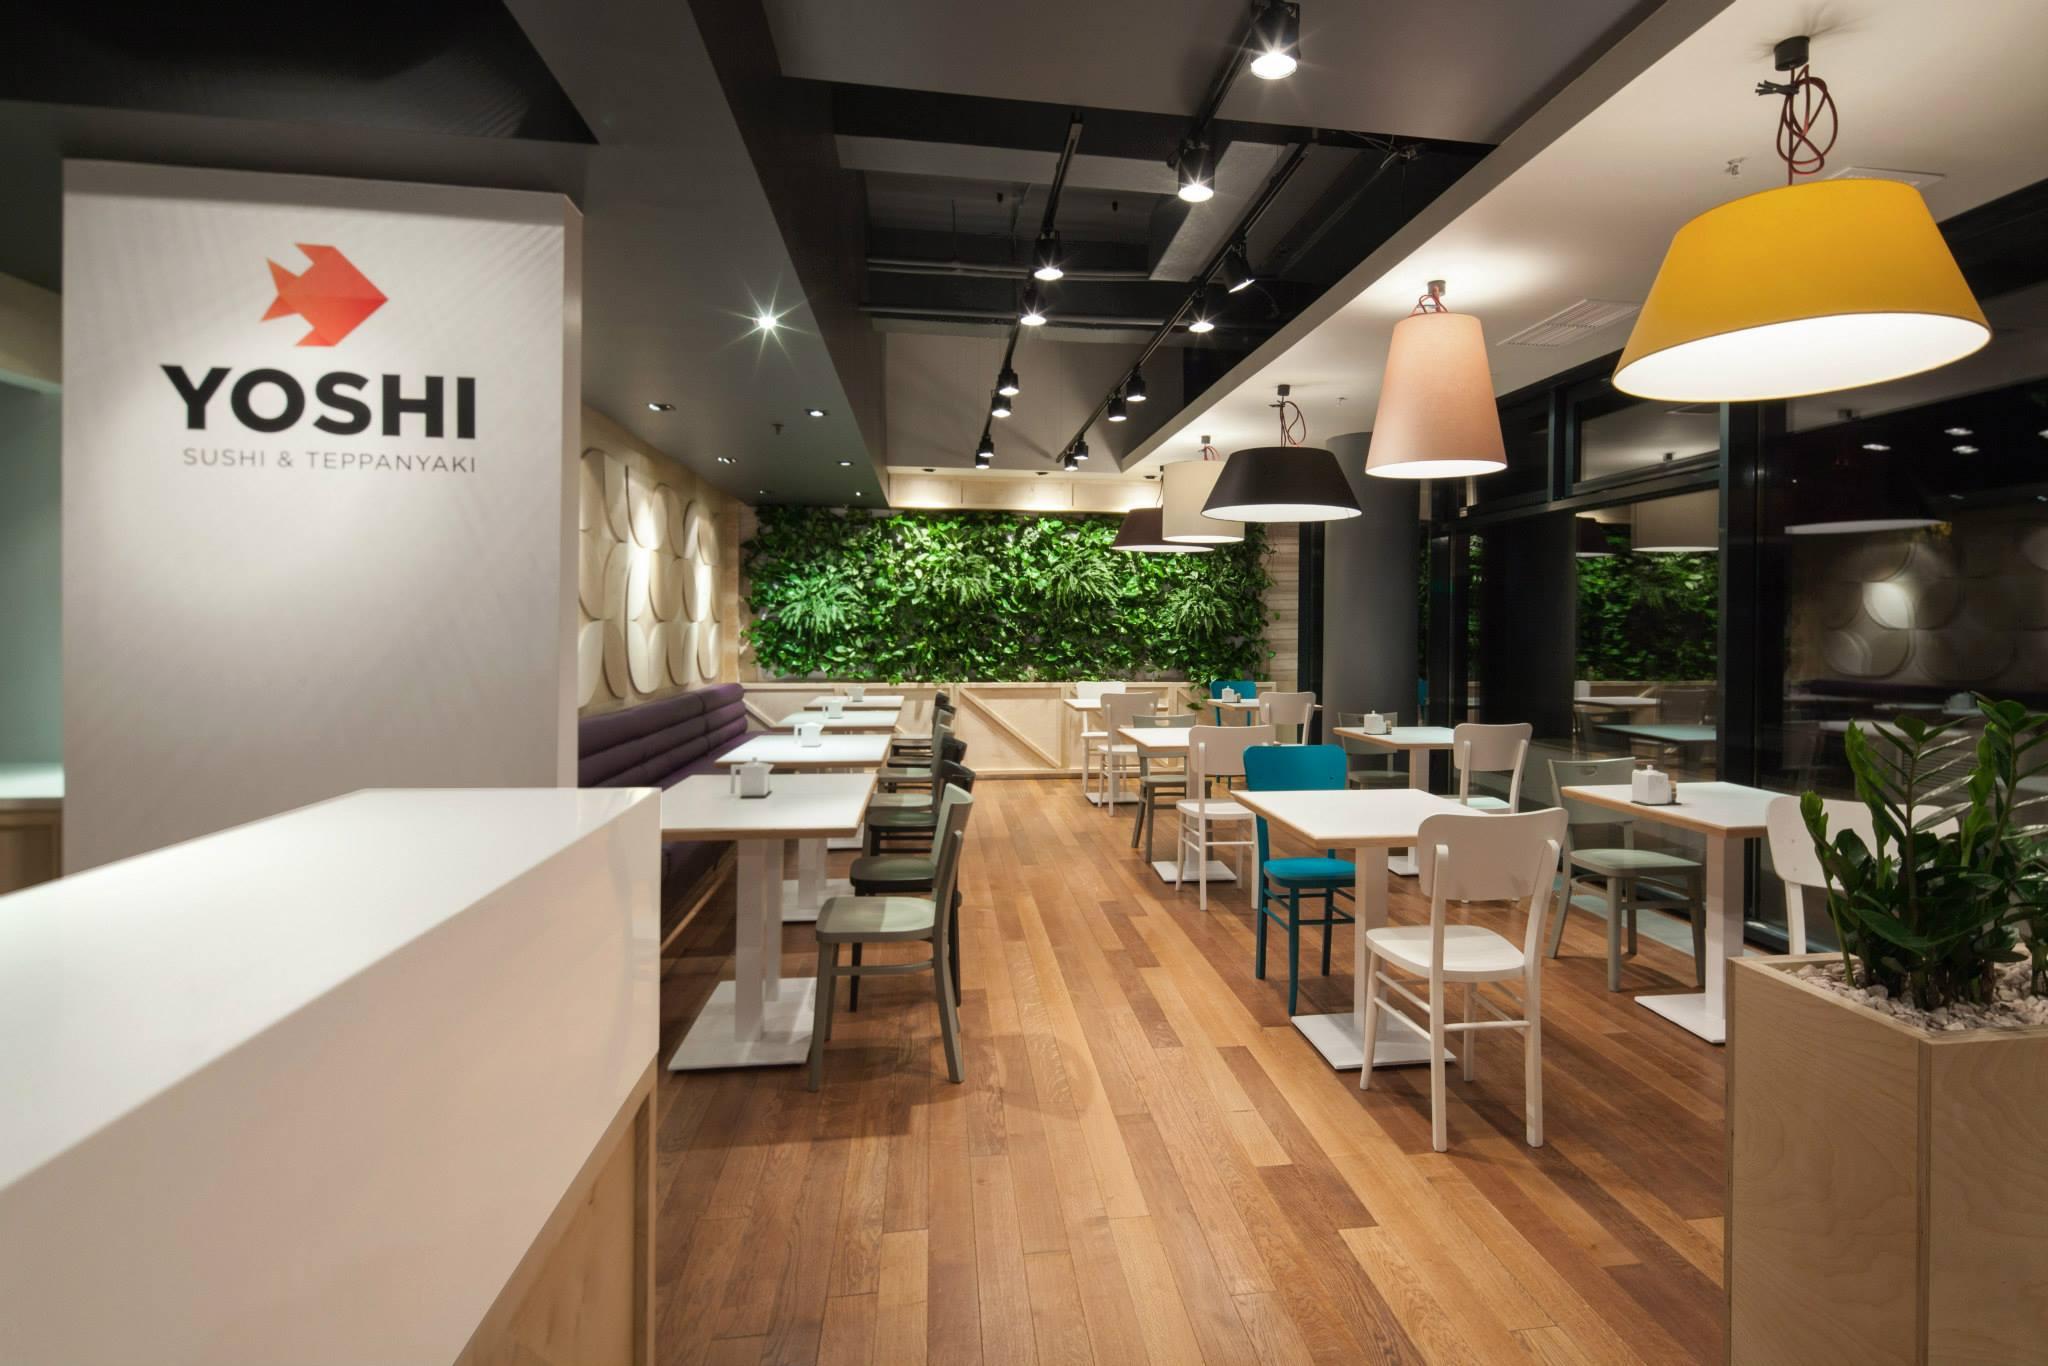 YOSHI-Sushi-Teppanyaki-Trivenus-Ama-Design-01